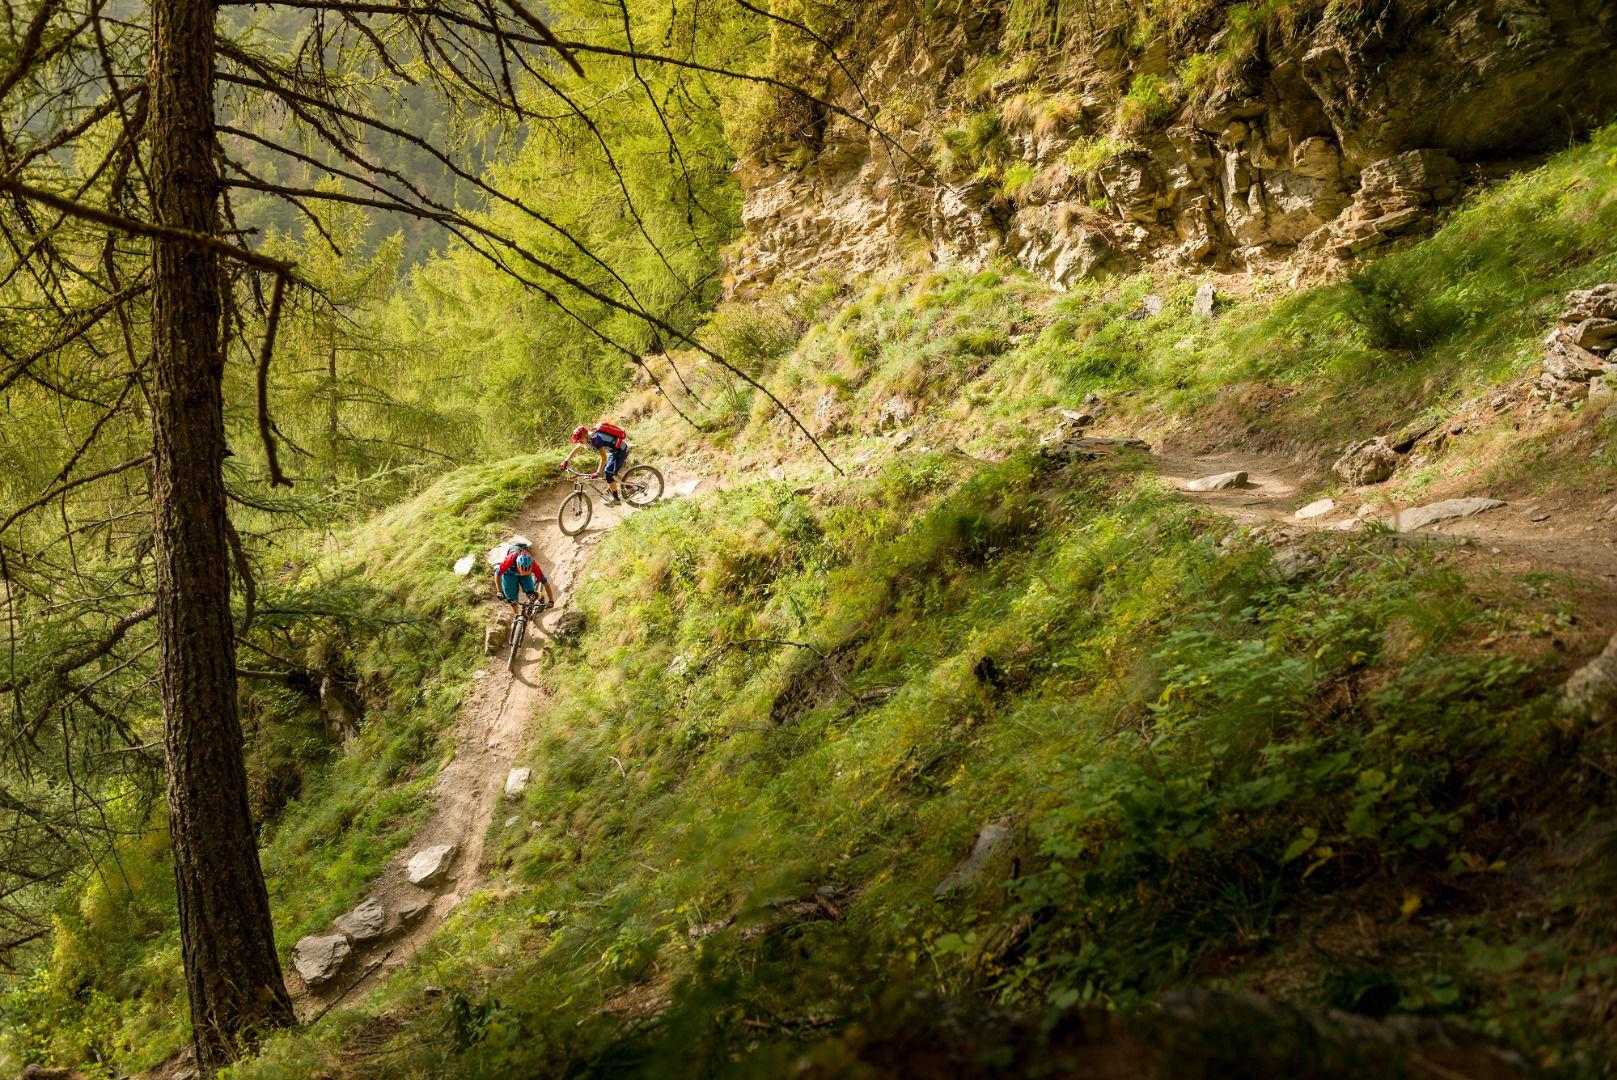 mountainbiken-montoni-tour-vinschgau-kjs